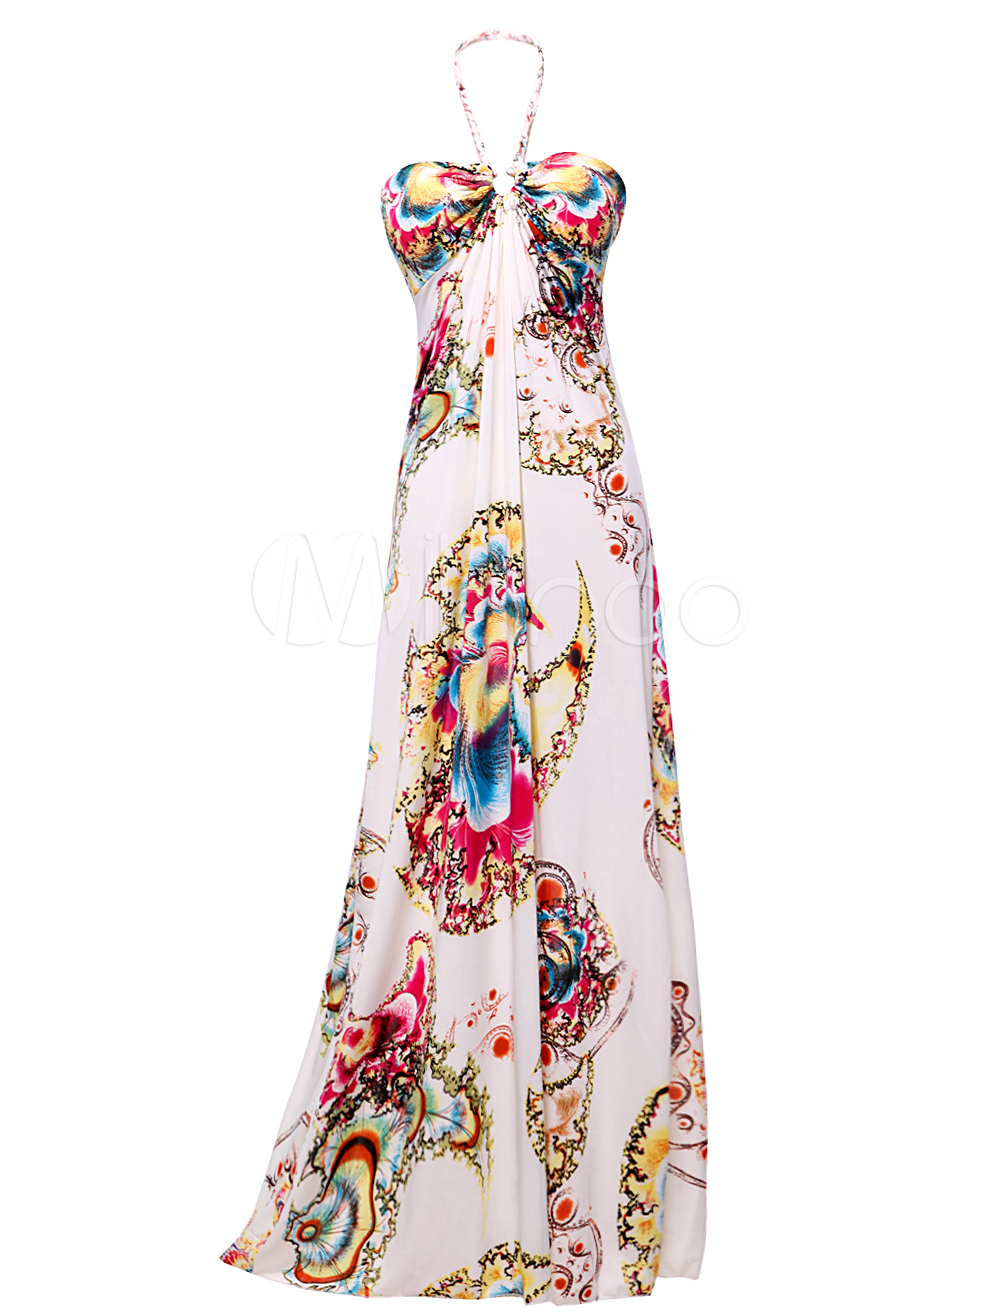 robe longue blanche imprime colore licou milanoocom - Robe Longue Colore